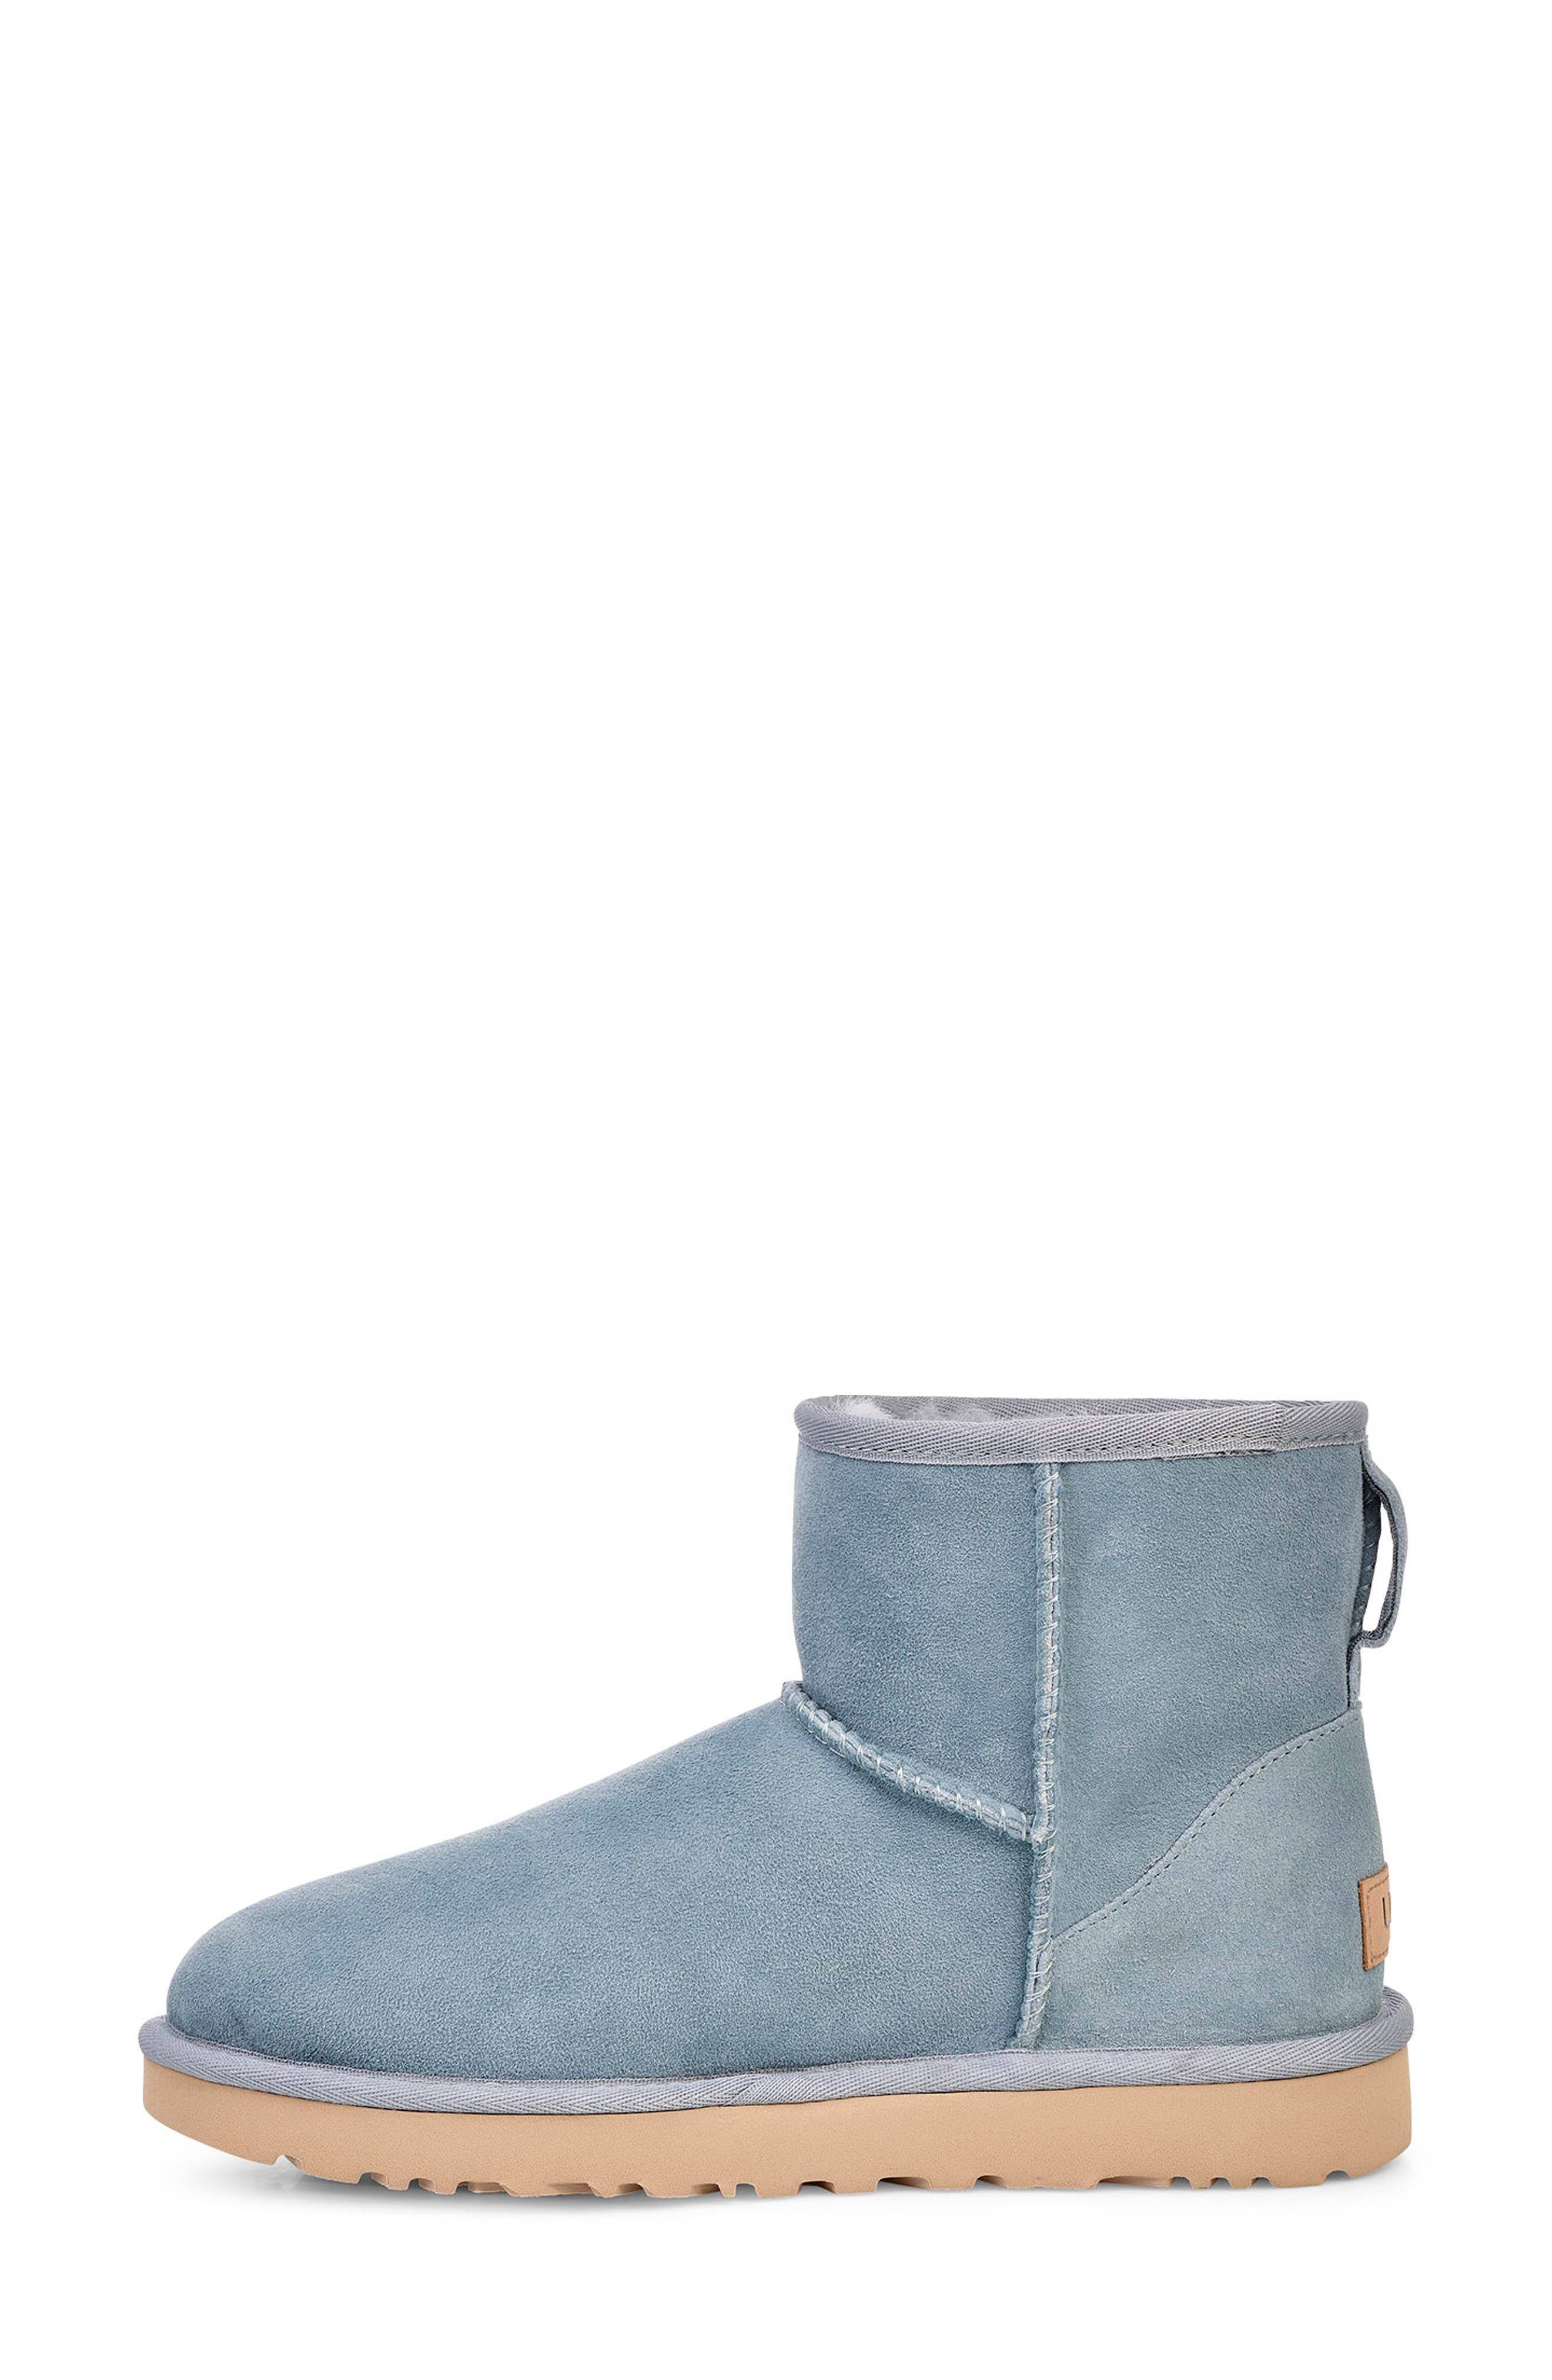 ,                             Classic Mini II Genuine Shearling Lined Boot,                             Alternate thumbnail 44, color,                             402